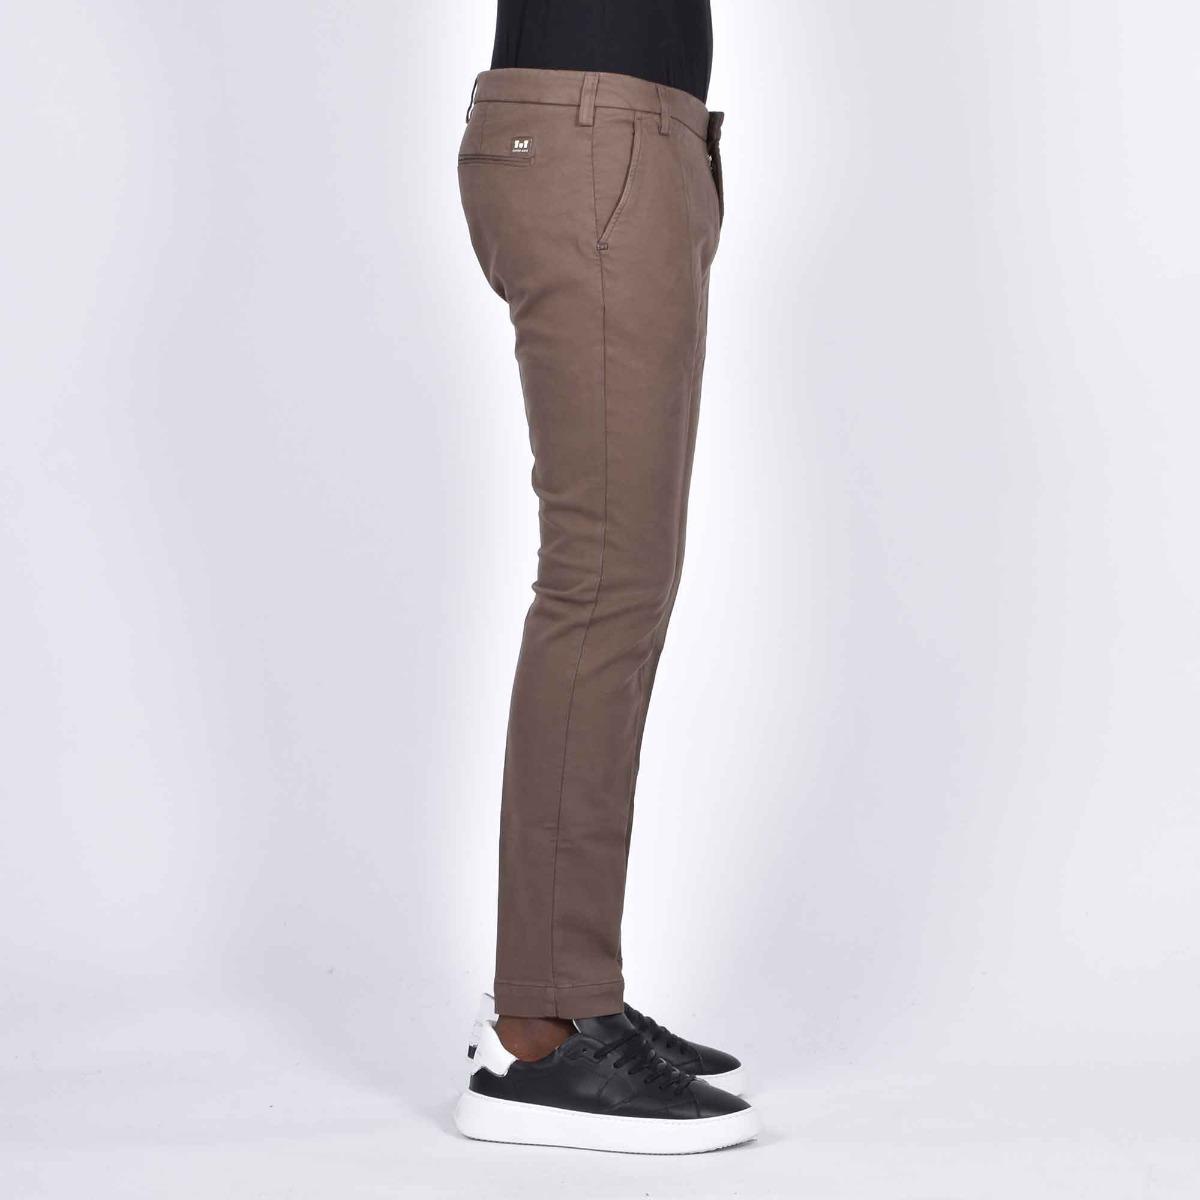 Pantalone tasca america - Marrone chiaro